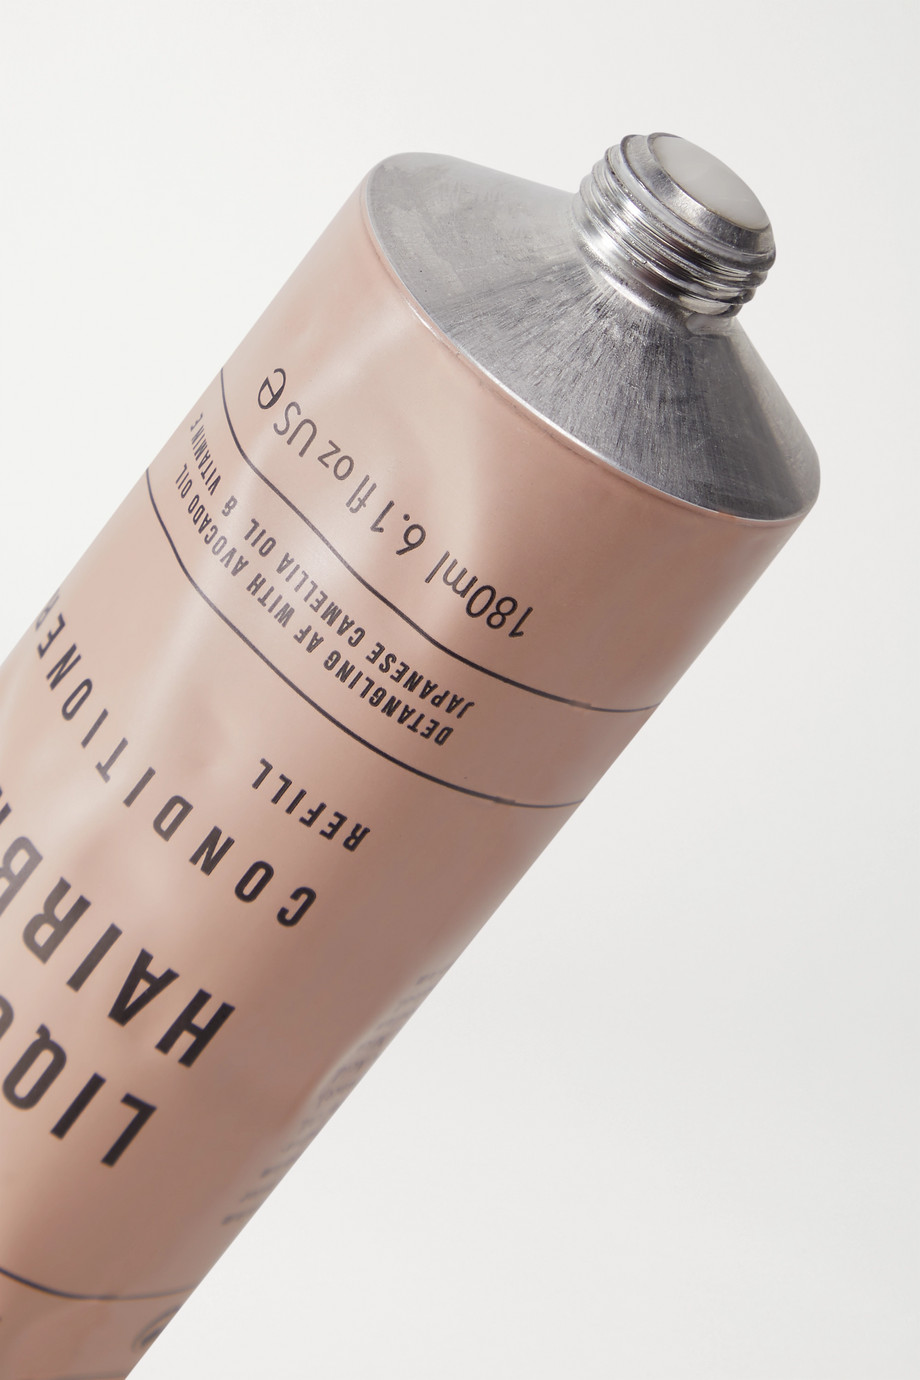 Larry King Liquid Hairbrush Conditioner Refill, 180ml